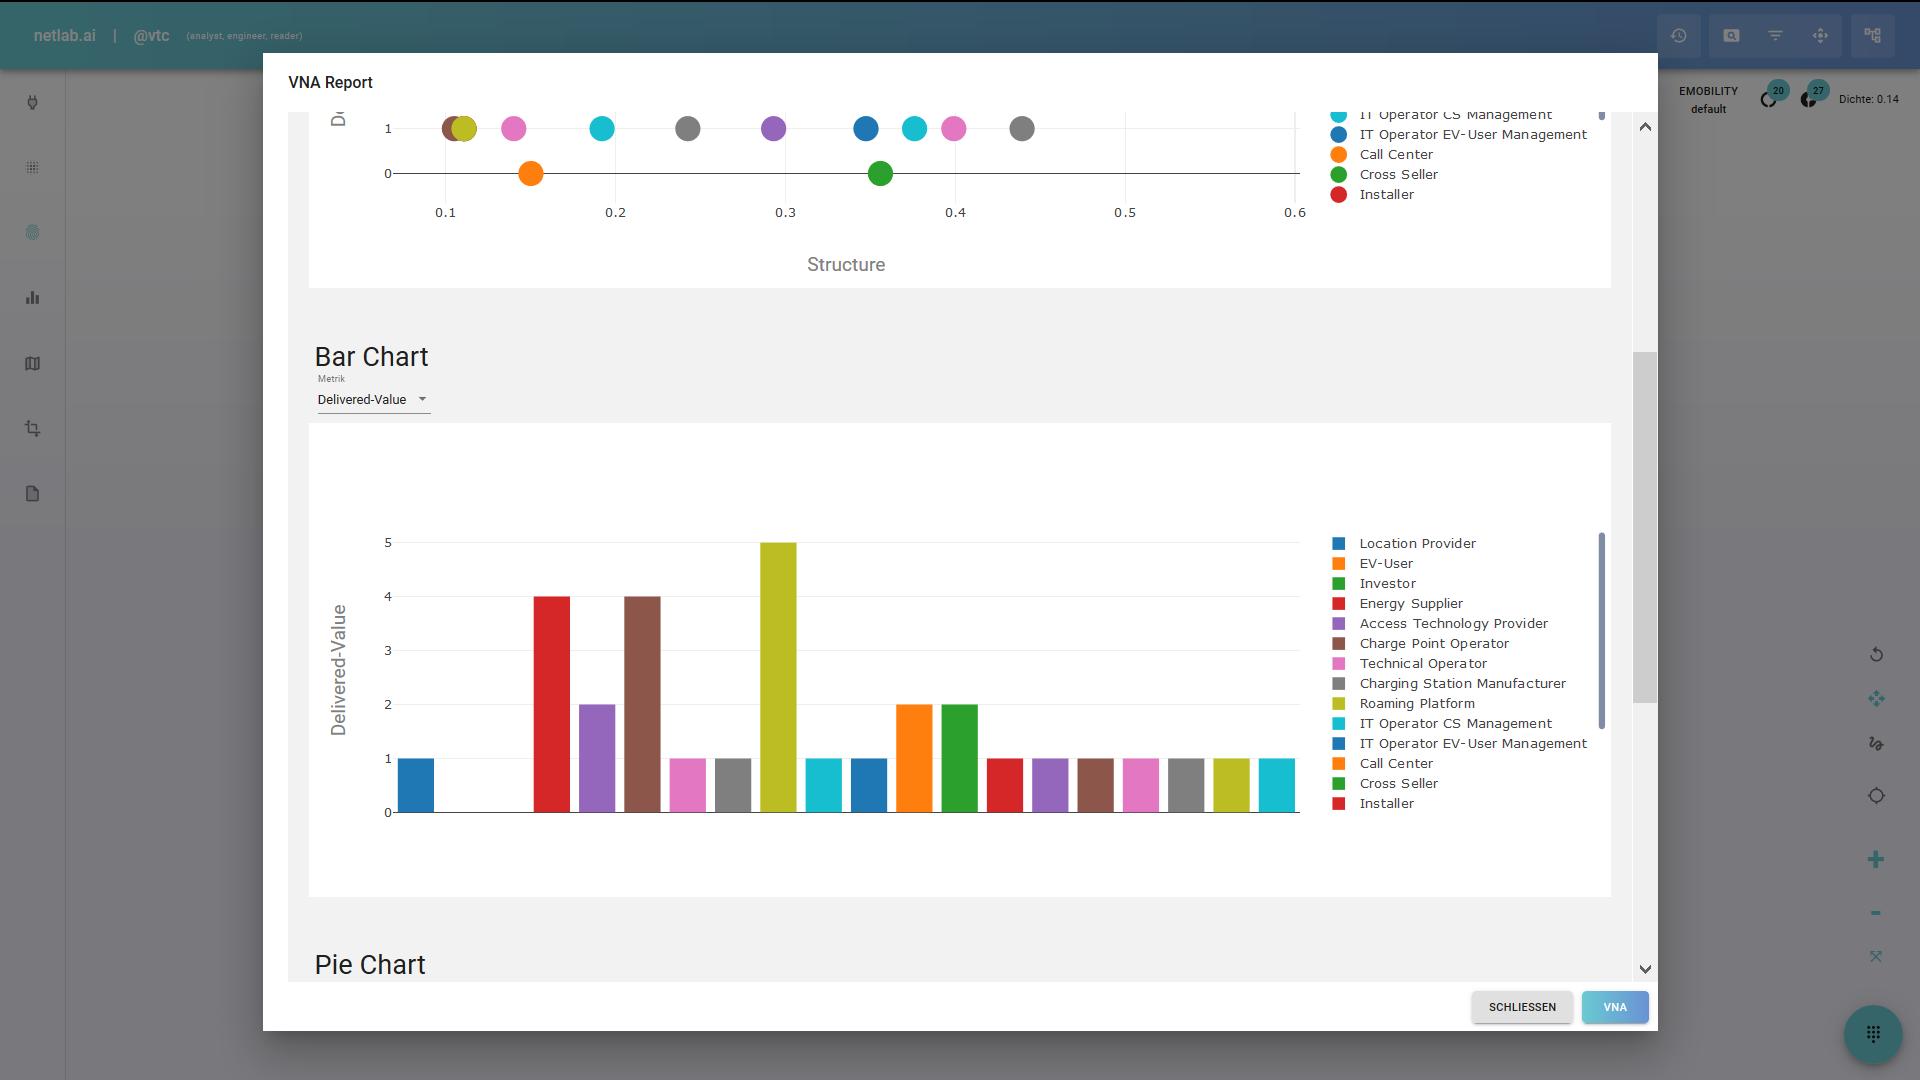 4_Value_Network_Analysis_Bar_Chart